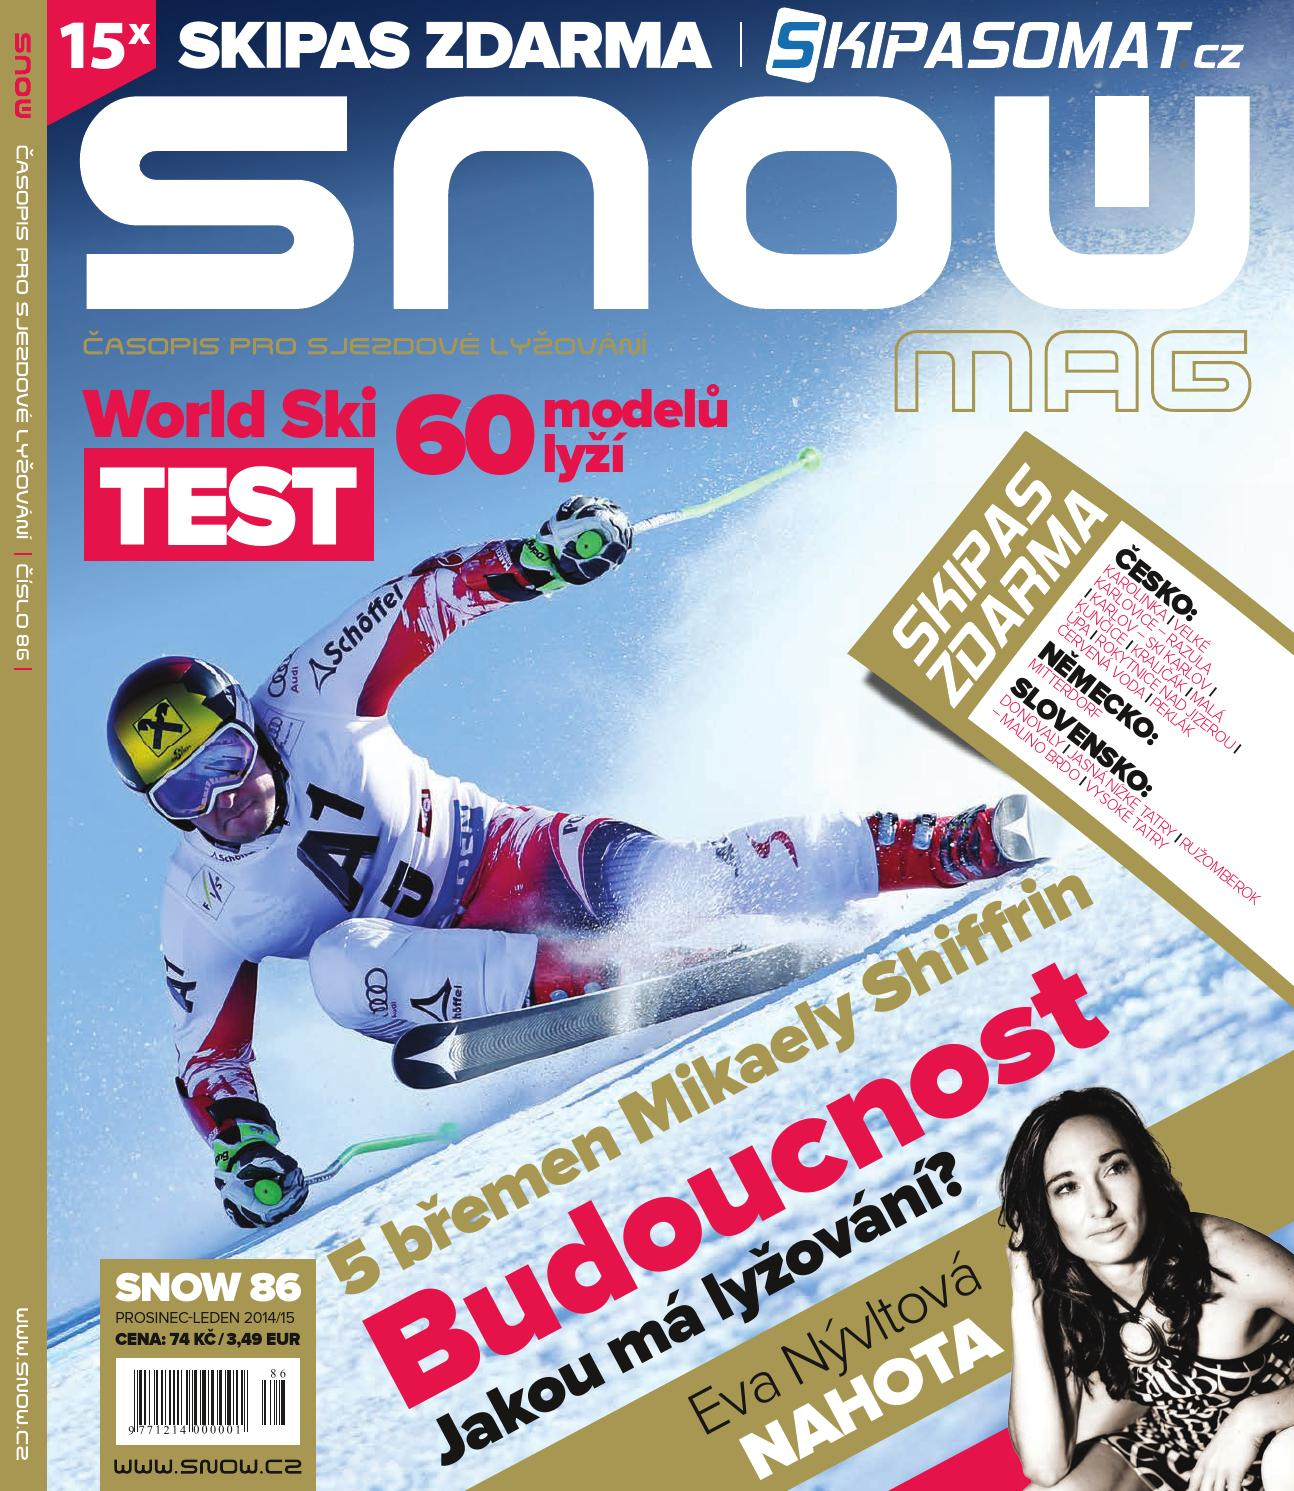 SNOW 86 - prosinec-leden 2014 2015 by SNOW CZ s.r.o. - issuu 6f71250686